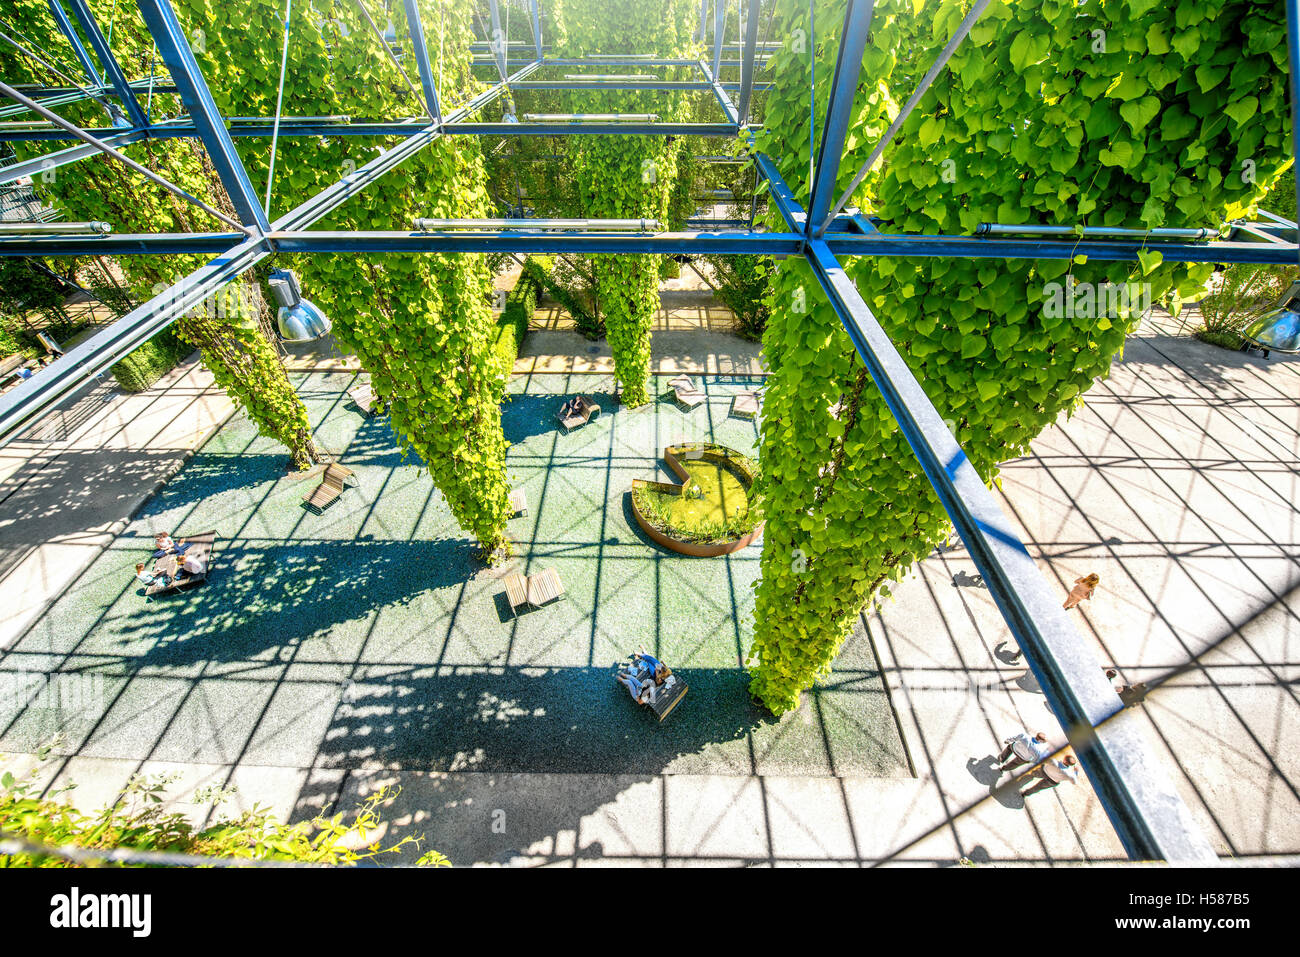 MFO-park in Zurich - Stock Image